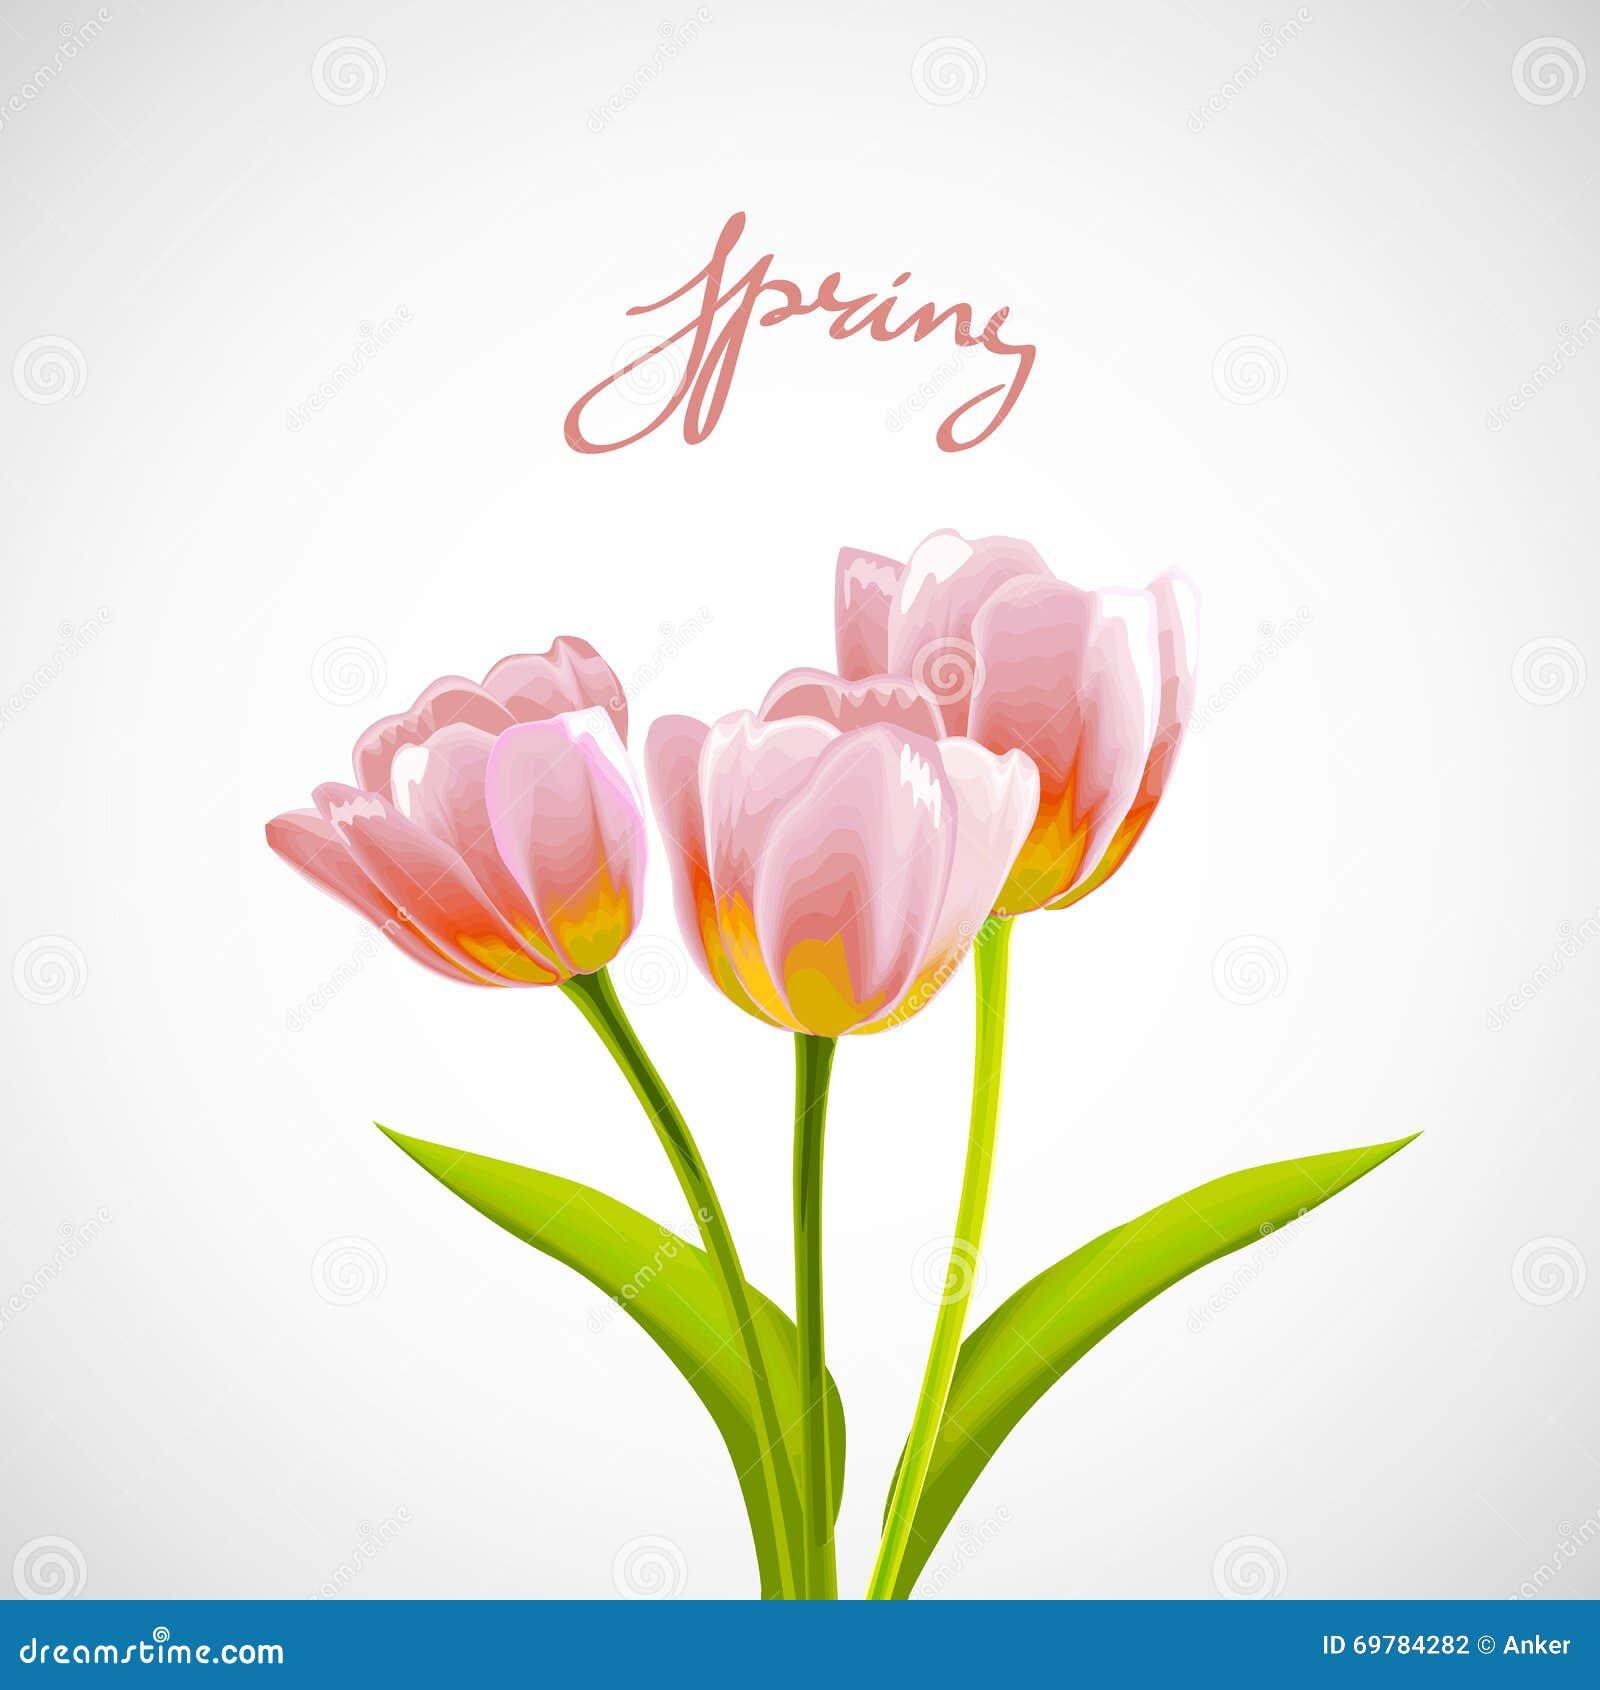 Flower Tulip Background. Stock Vector. Image Of Love